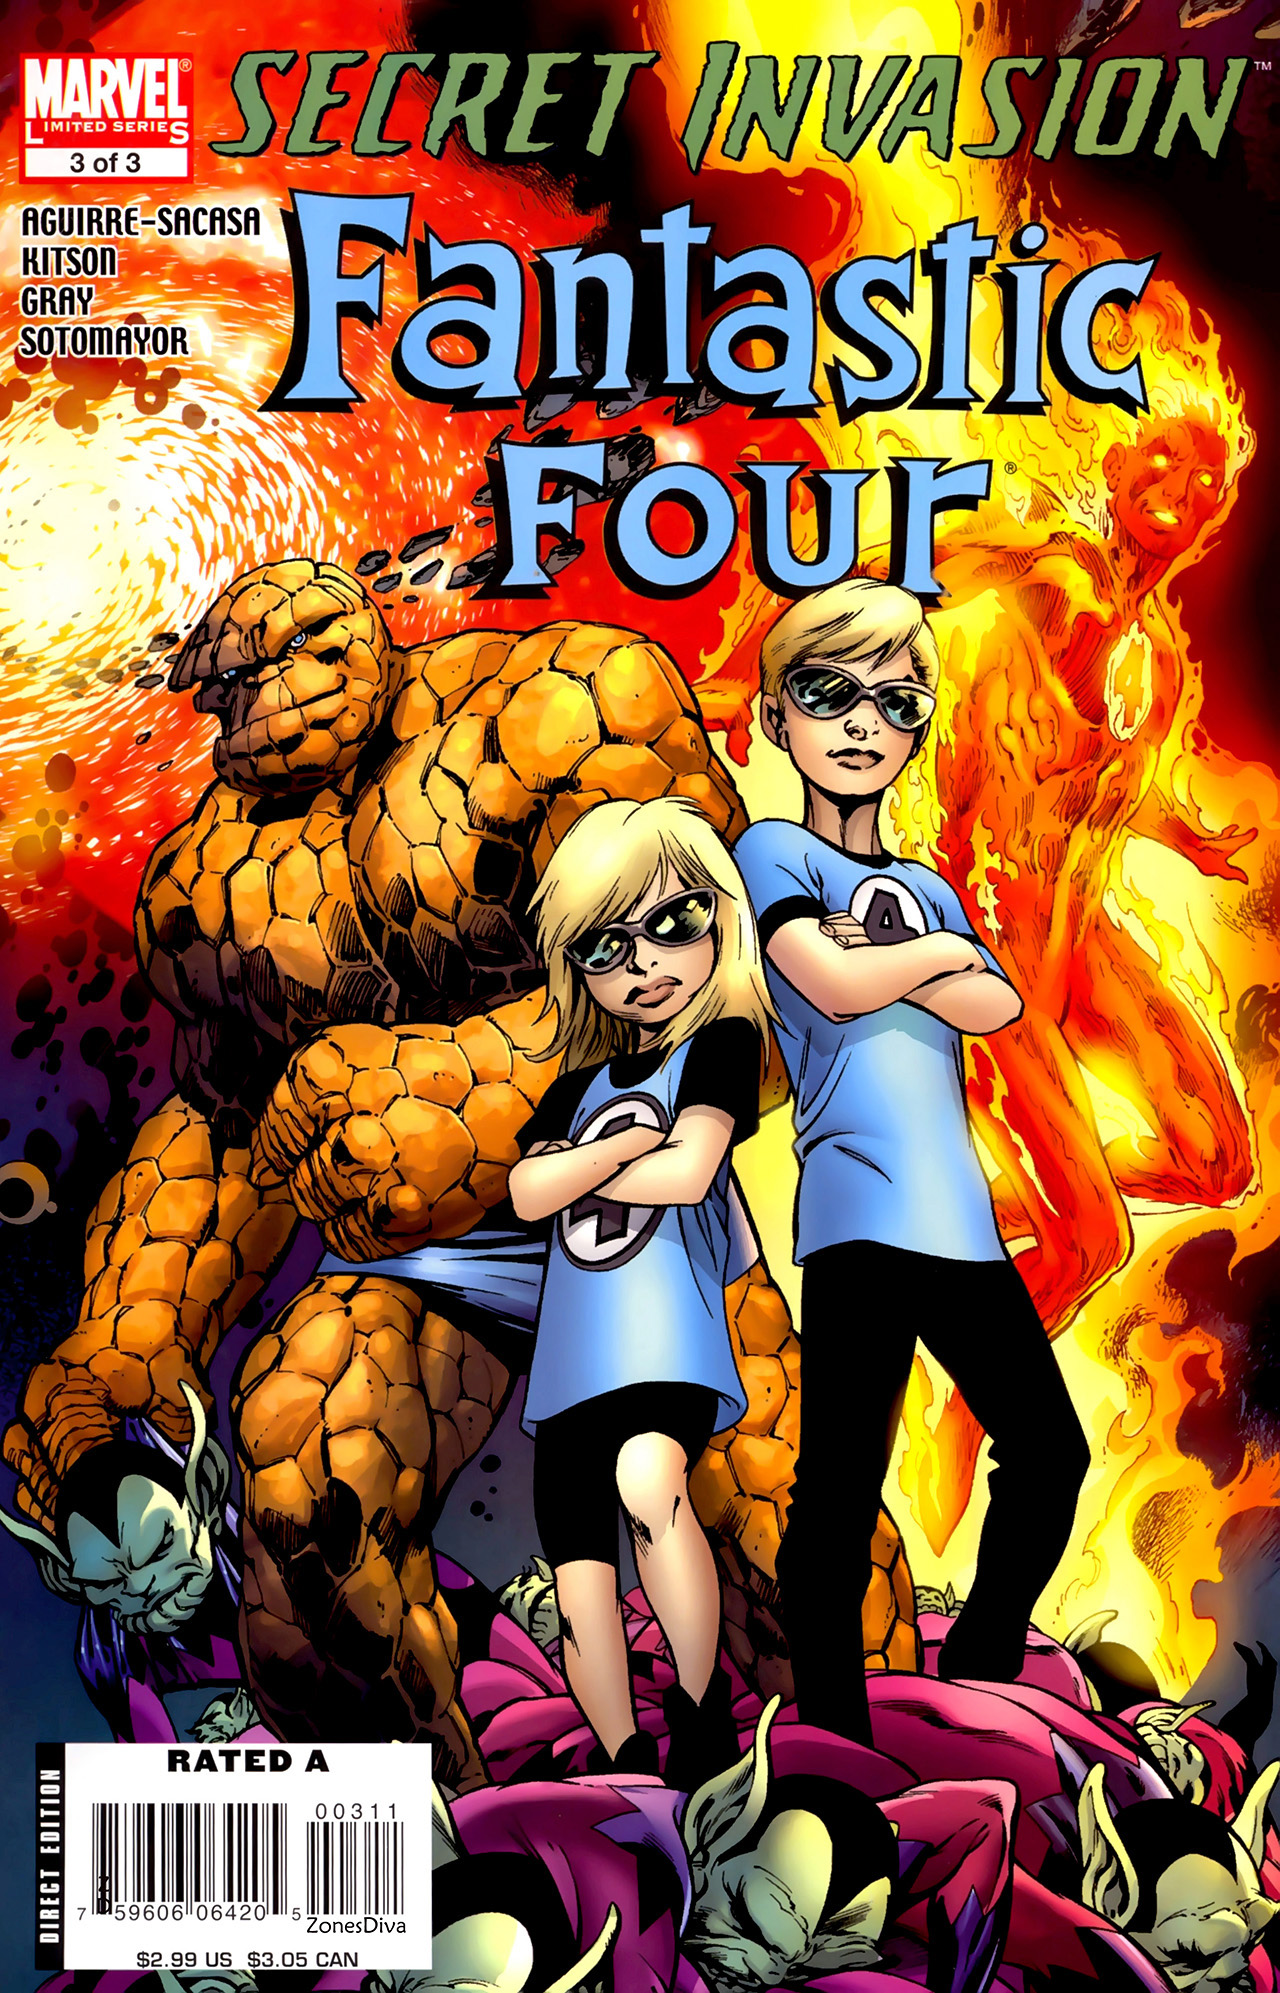 Read online Secret Invasion: Fantastic Four comic -  Issue #3 - 1